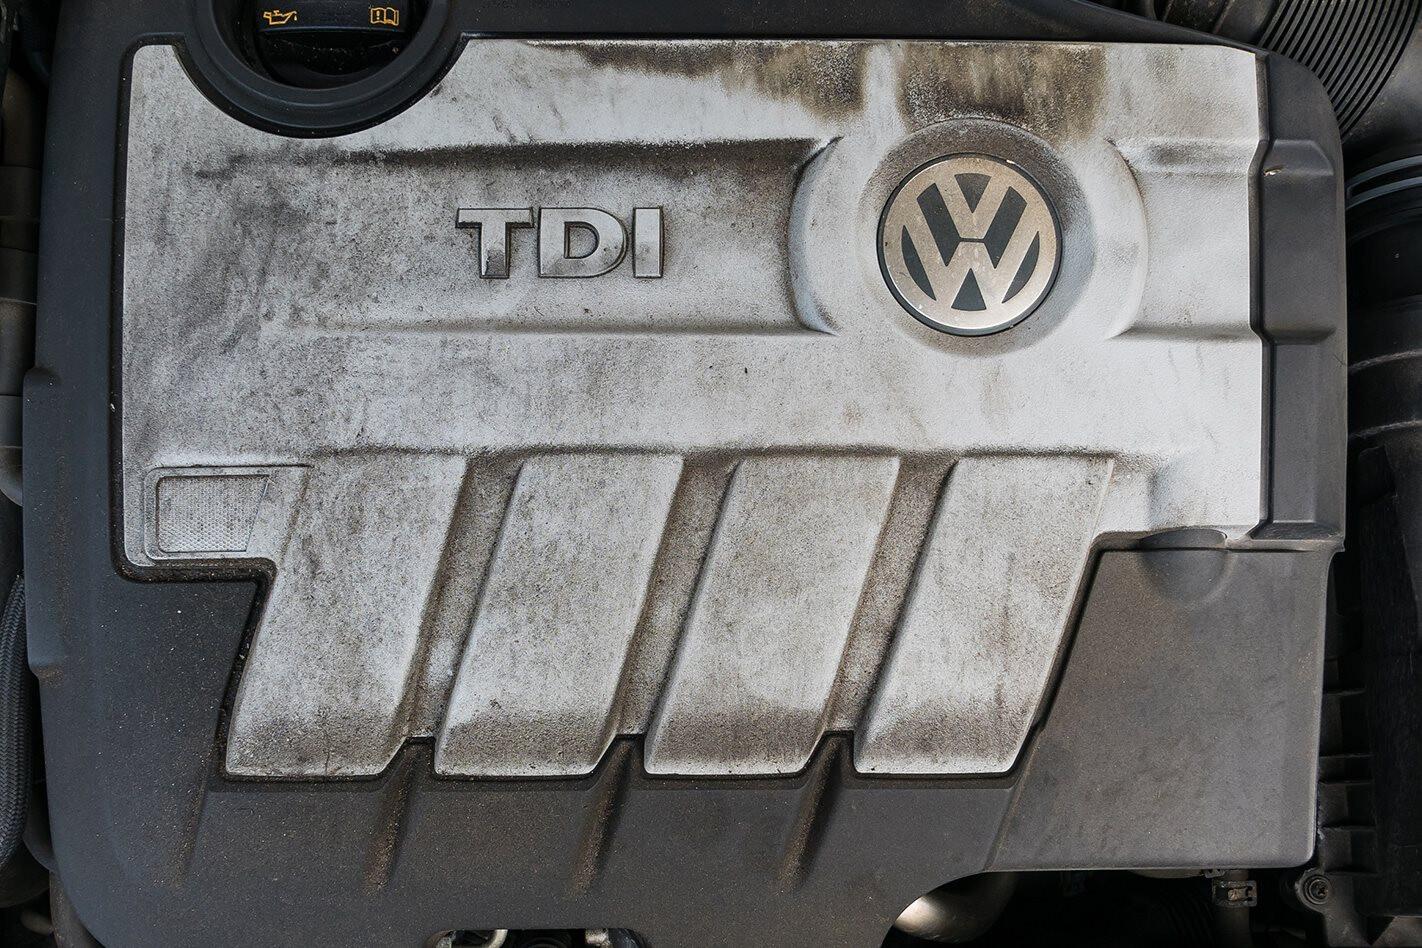 Dieselgate: Volkswagen insists Aussies don't deserve payouts